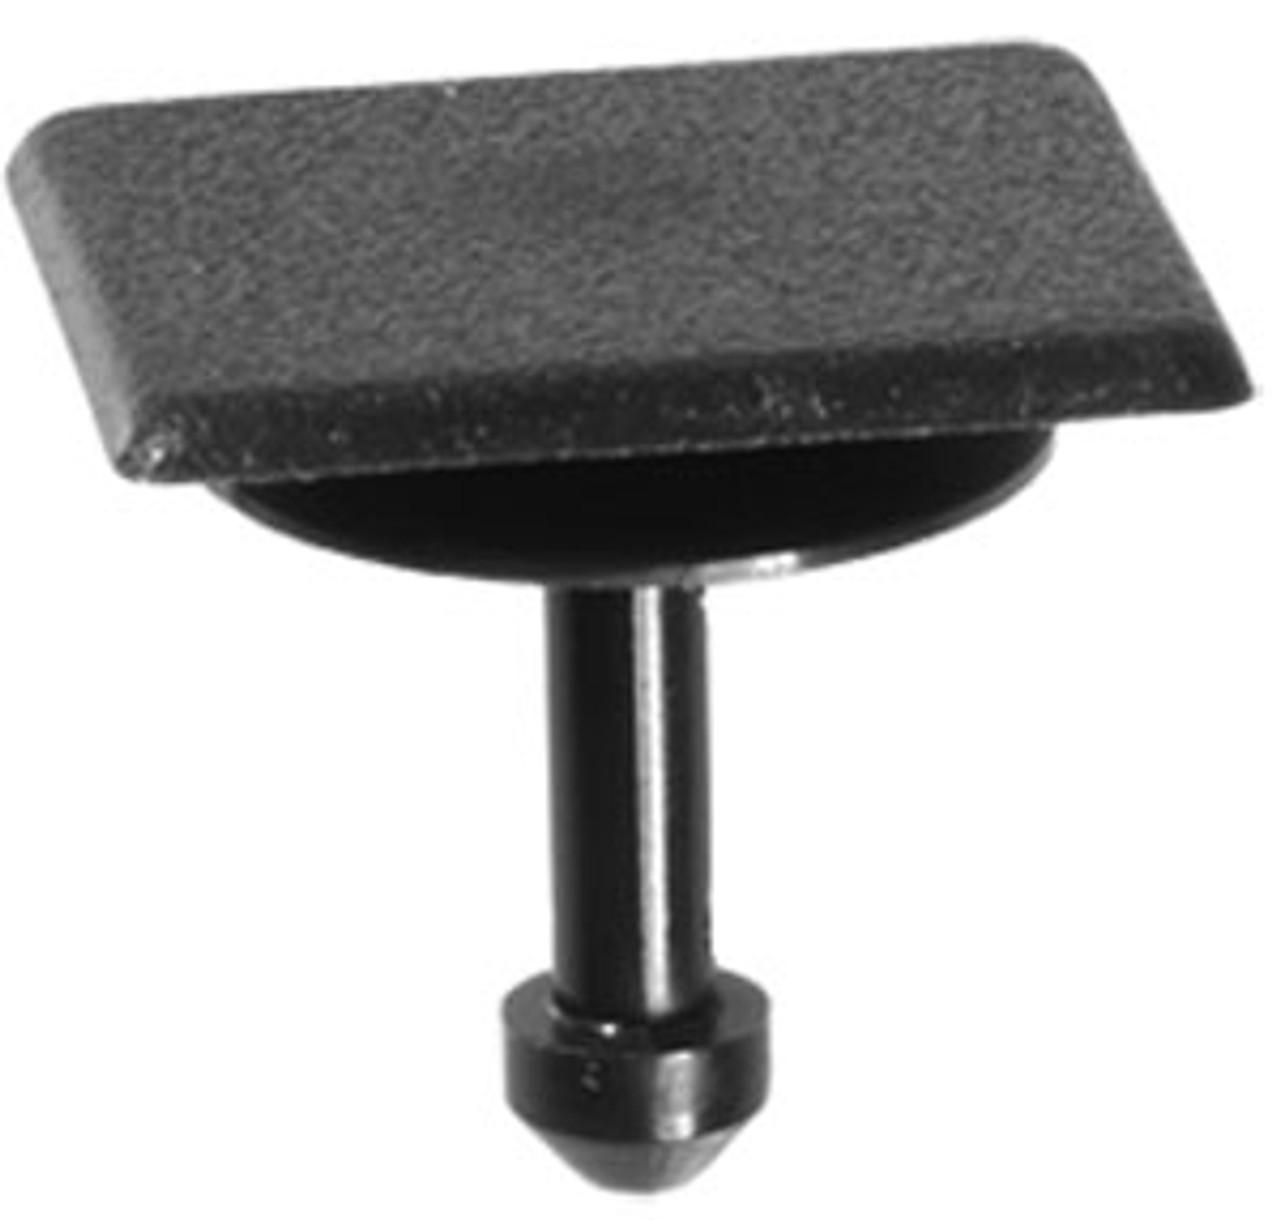 Cowl Panel Vent Cap Use With Auveco 21590 Top Head Size: 16mm x 18mm Bottom Head Diameter: 14mm Stem Length: 12mm Subaru Forester, Impreza, Legacy, Outback & WRX 2008-On OEM# 91486-KJ010 Black Nylon 15 Per Box Click Next Image For Clip Detail